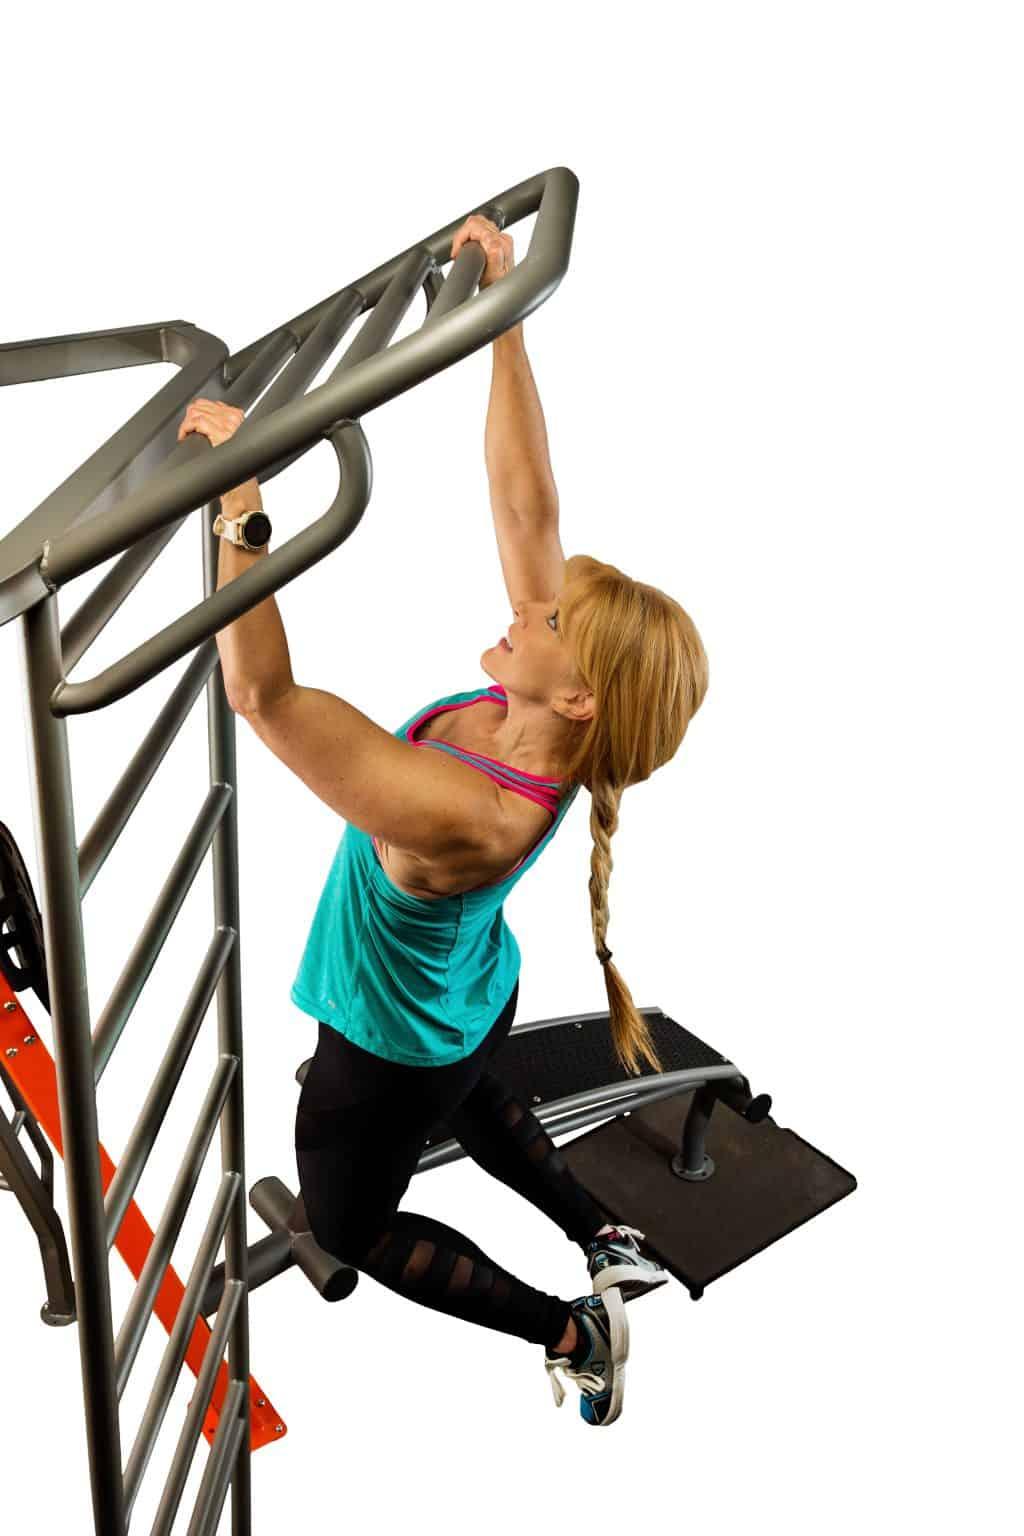 outdoor-fitness-equipment_49644069687_o-1024x1536